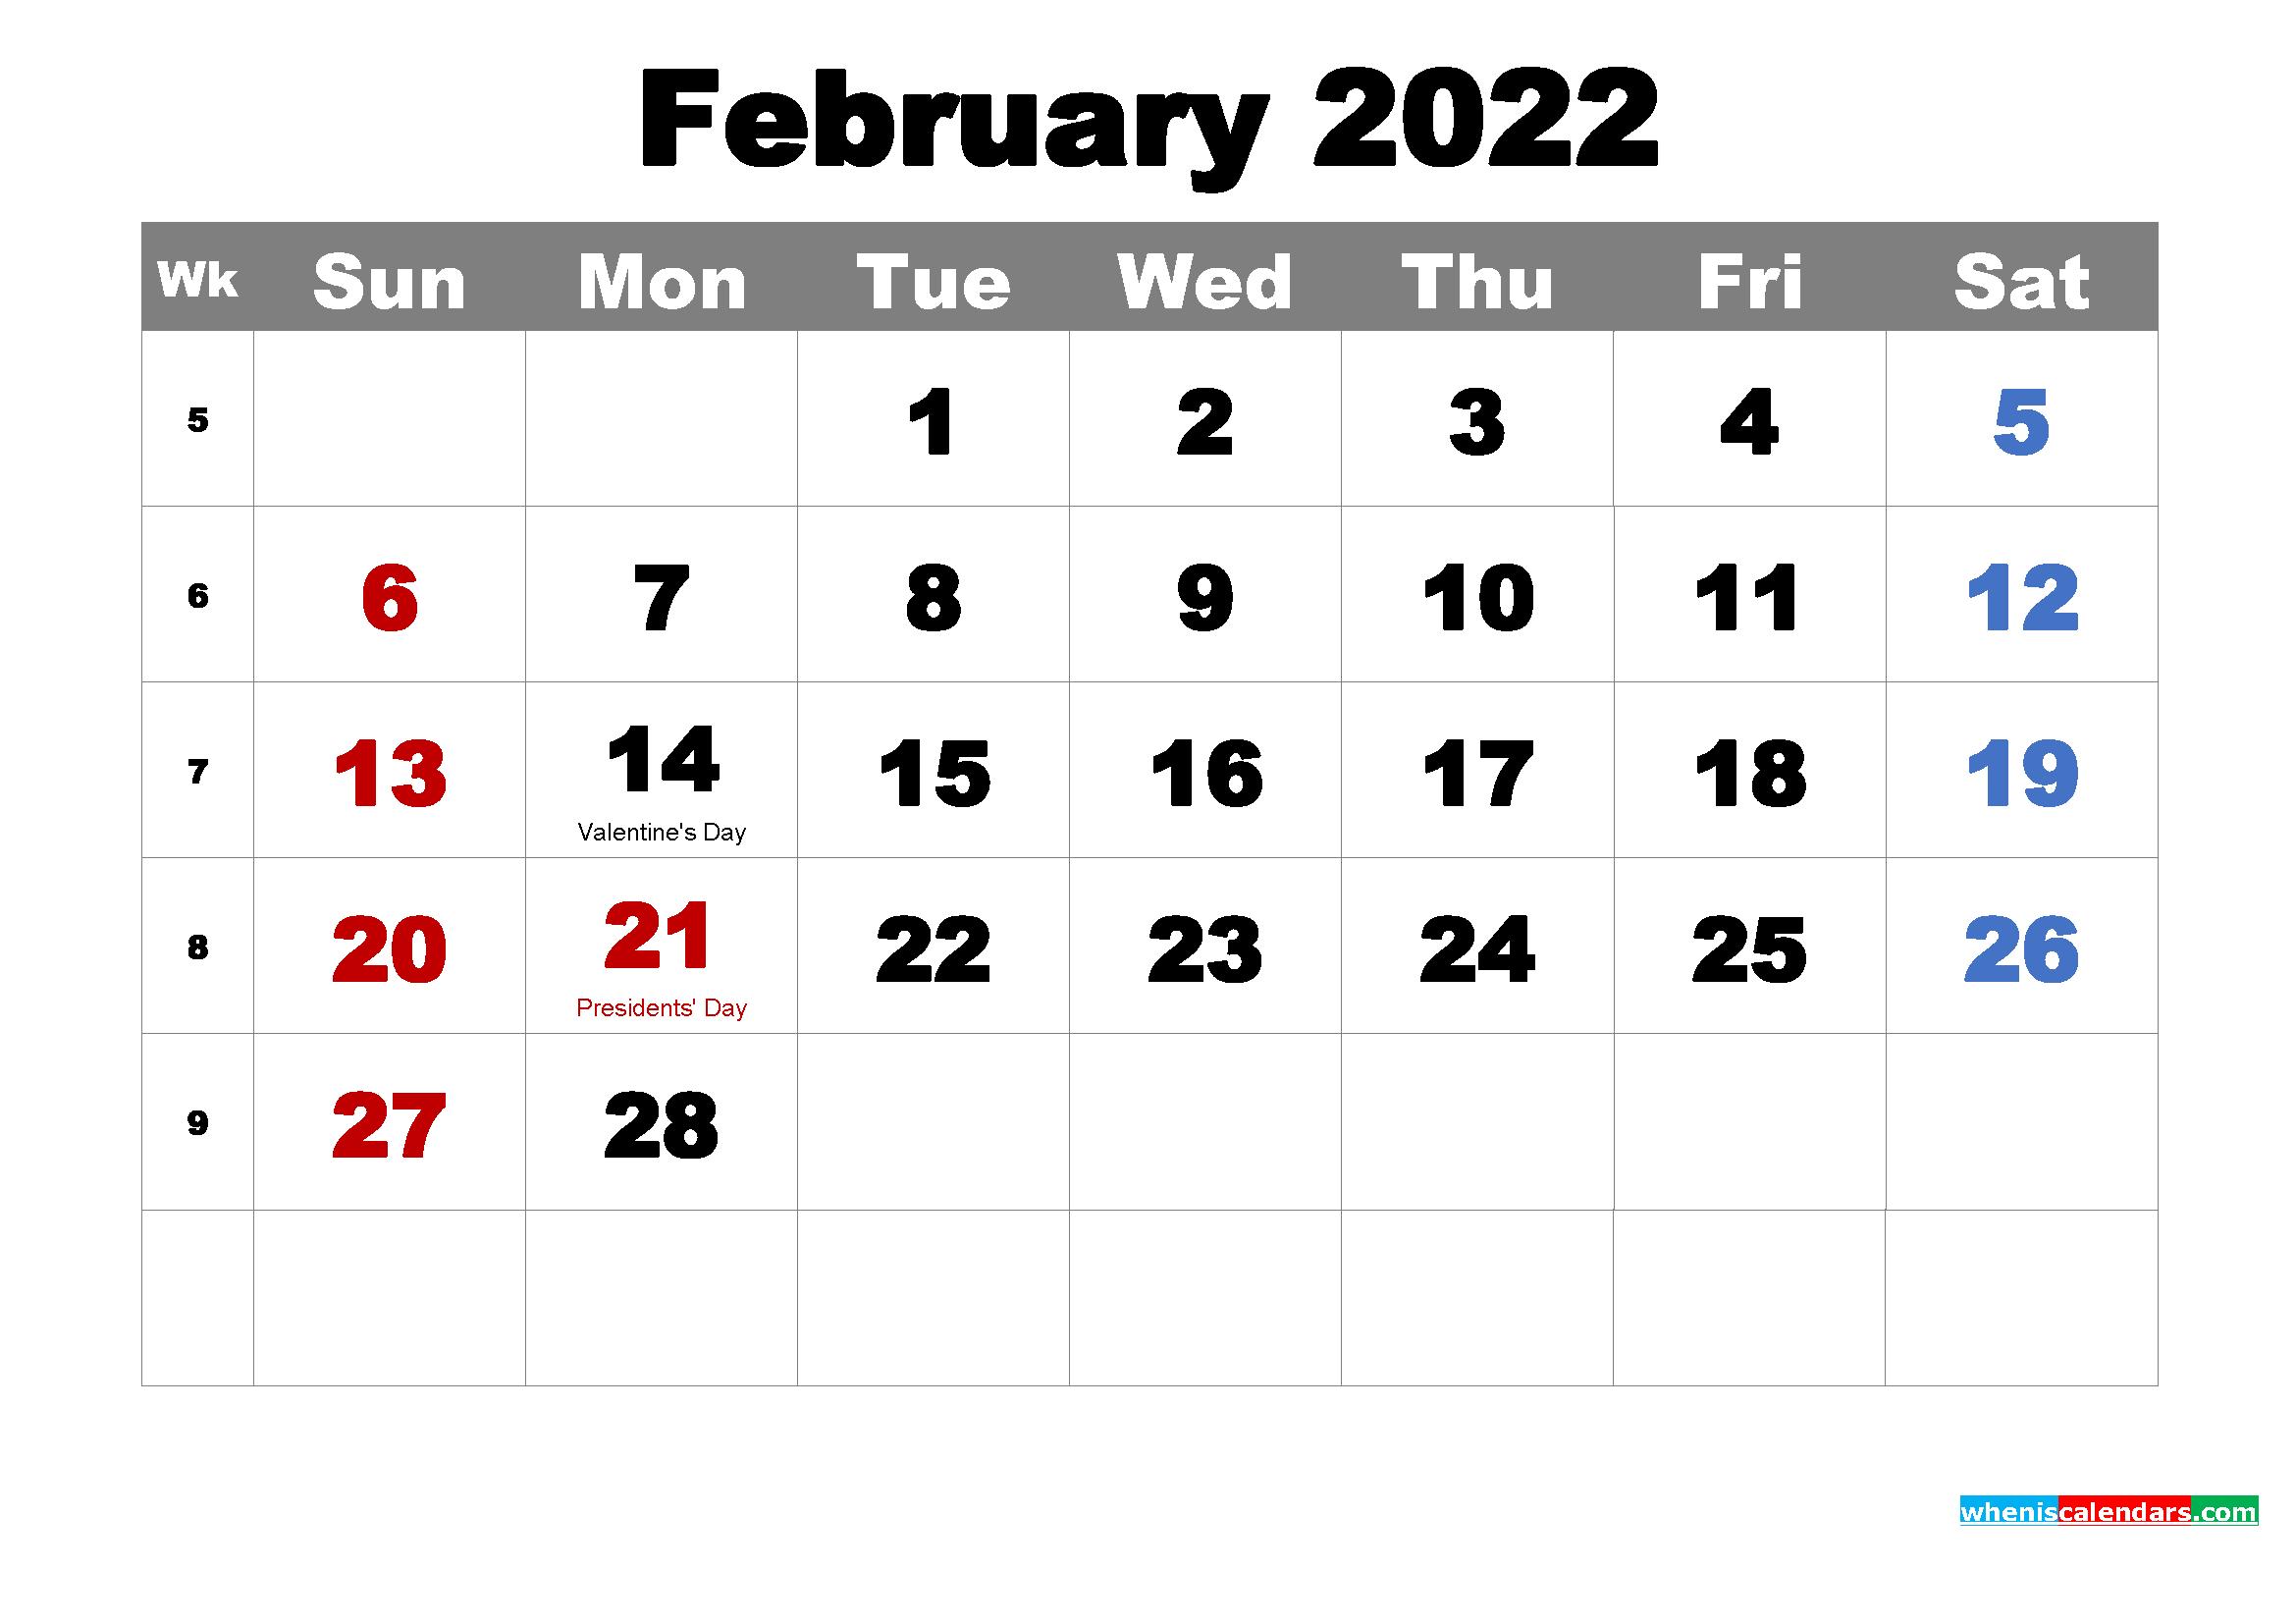 Free Printable February 2022 Calendar With Holidays As For Calendar Print Feb 2022